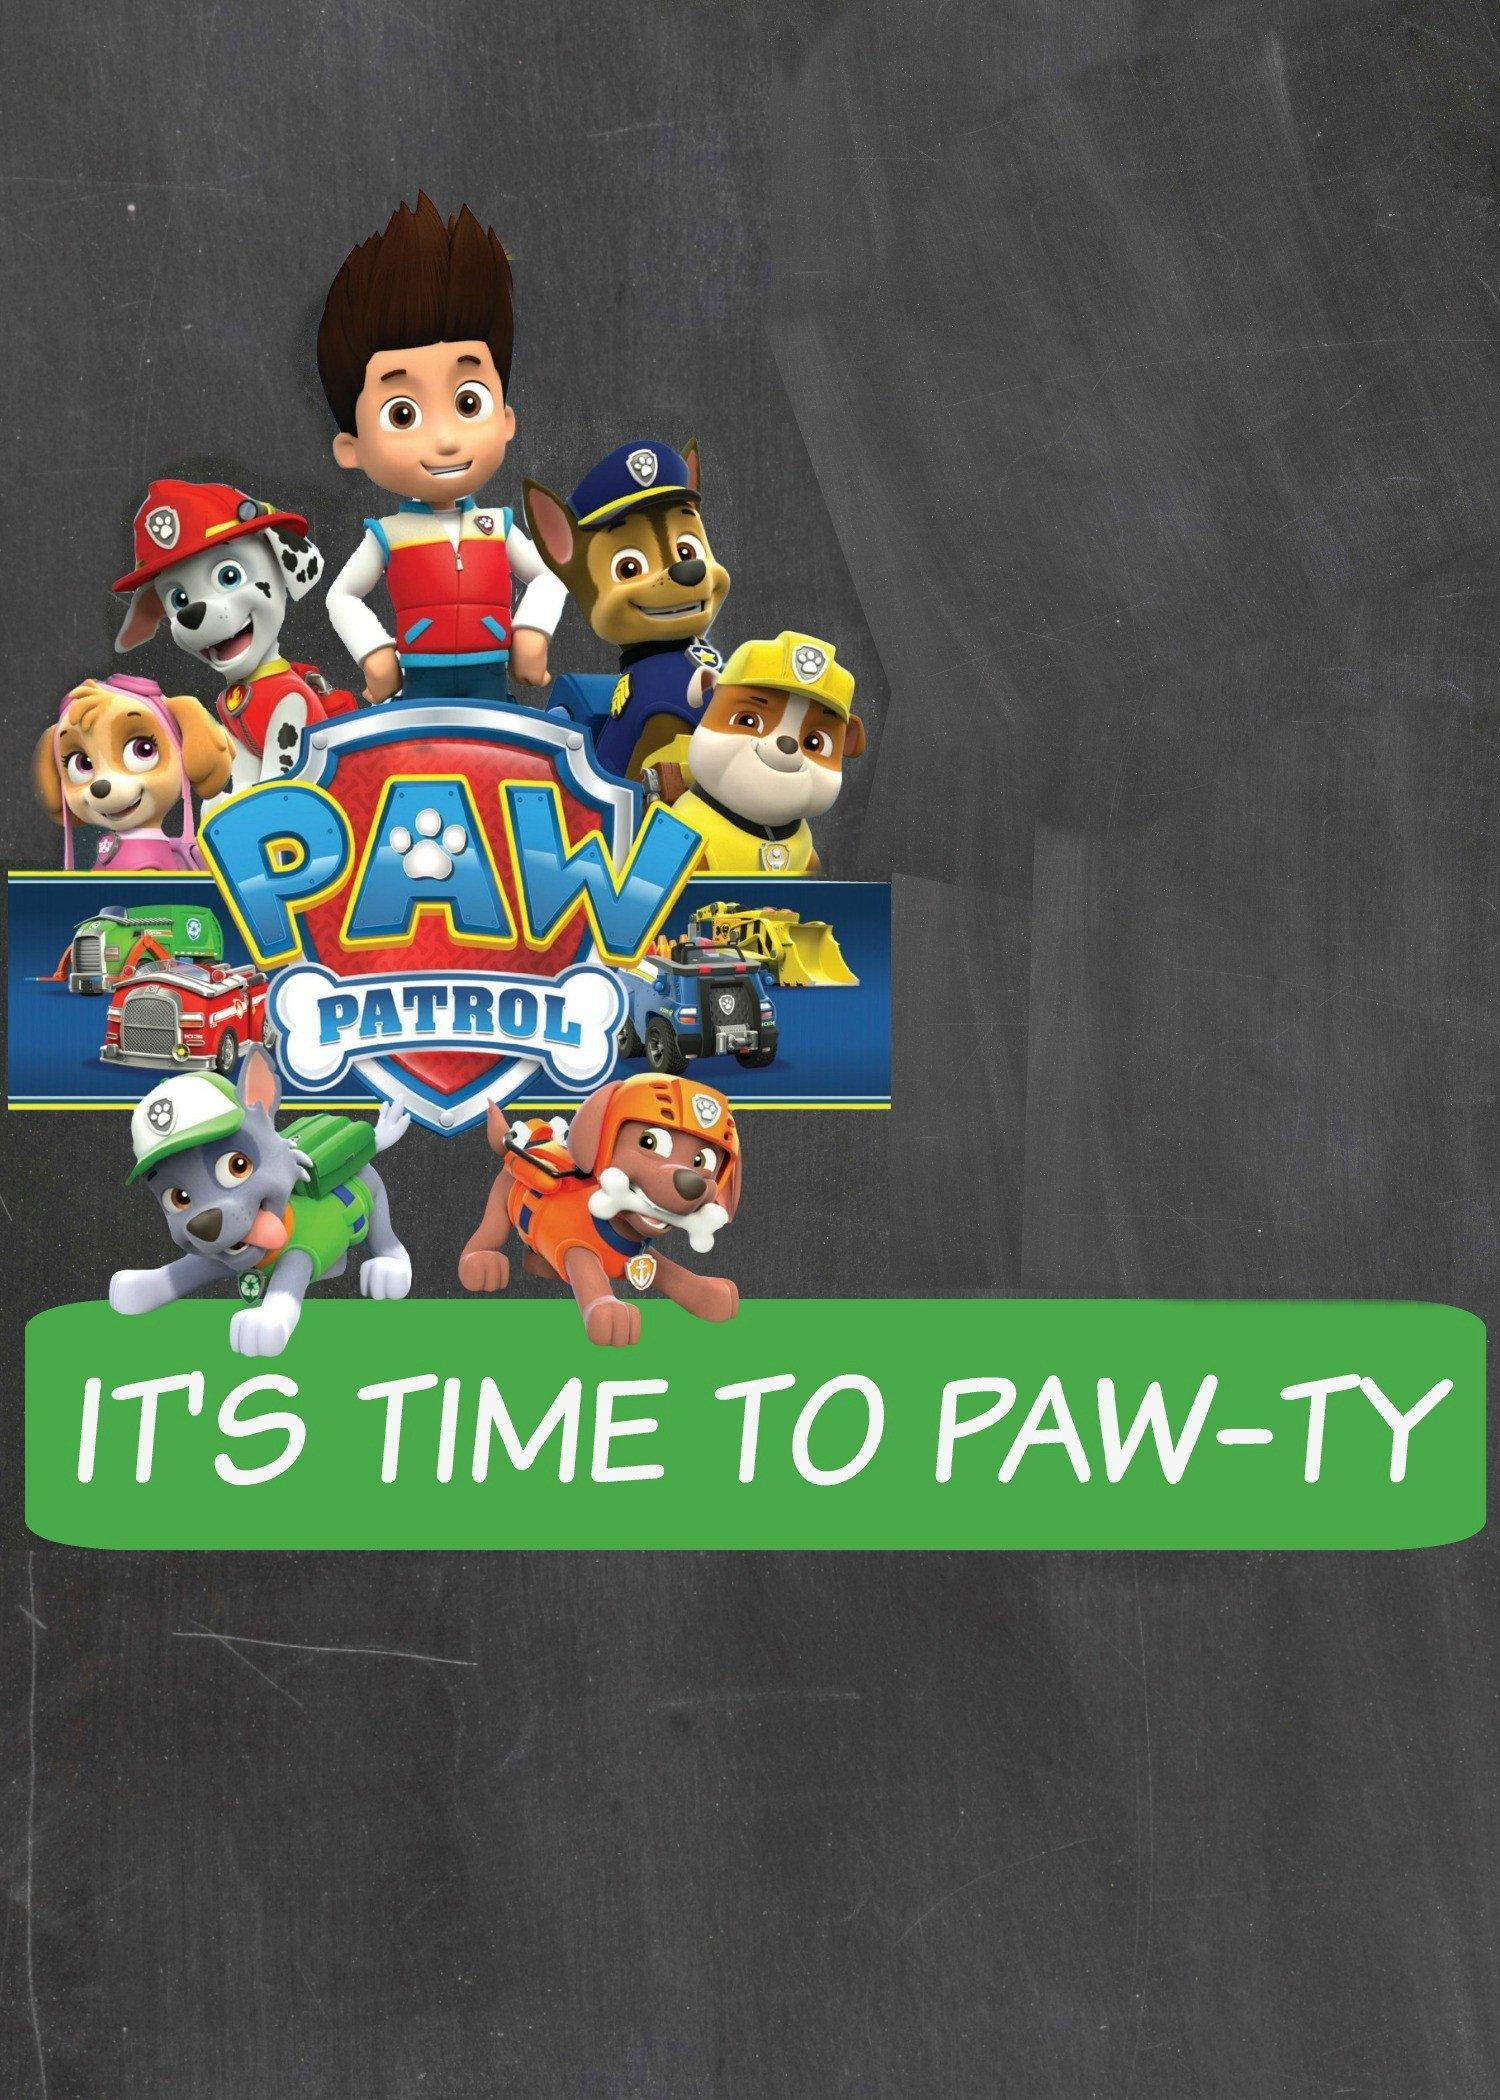 Paw Patrol Invitation Templates How to Make A Paw Patrol Digital Invitation